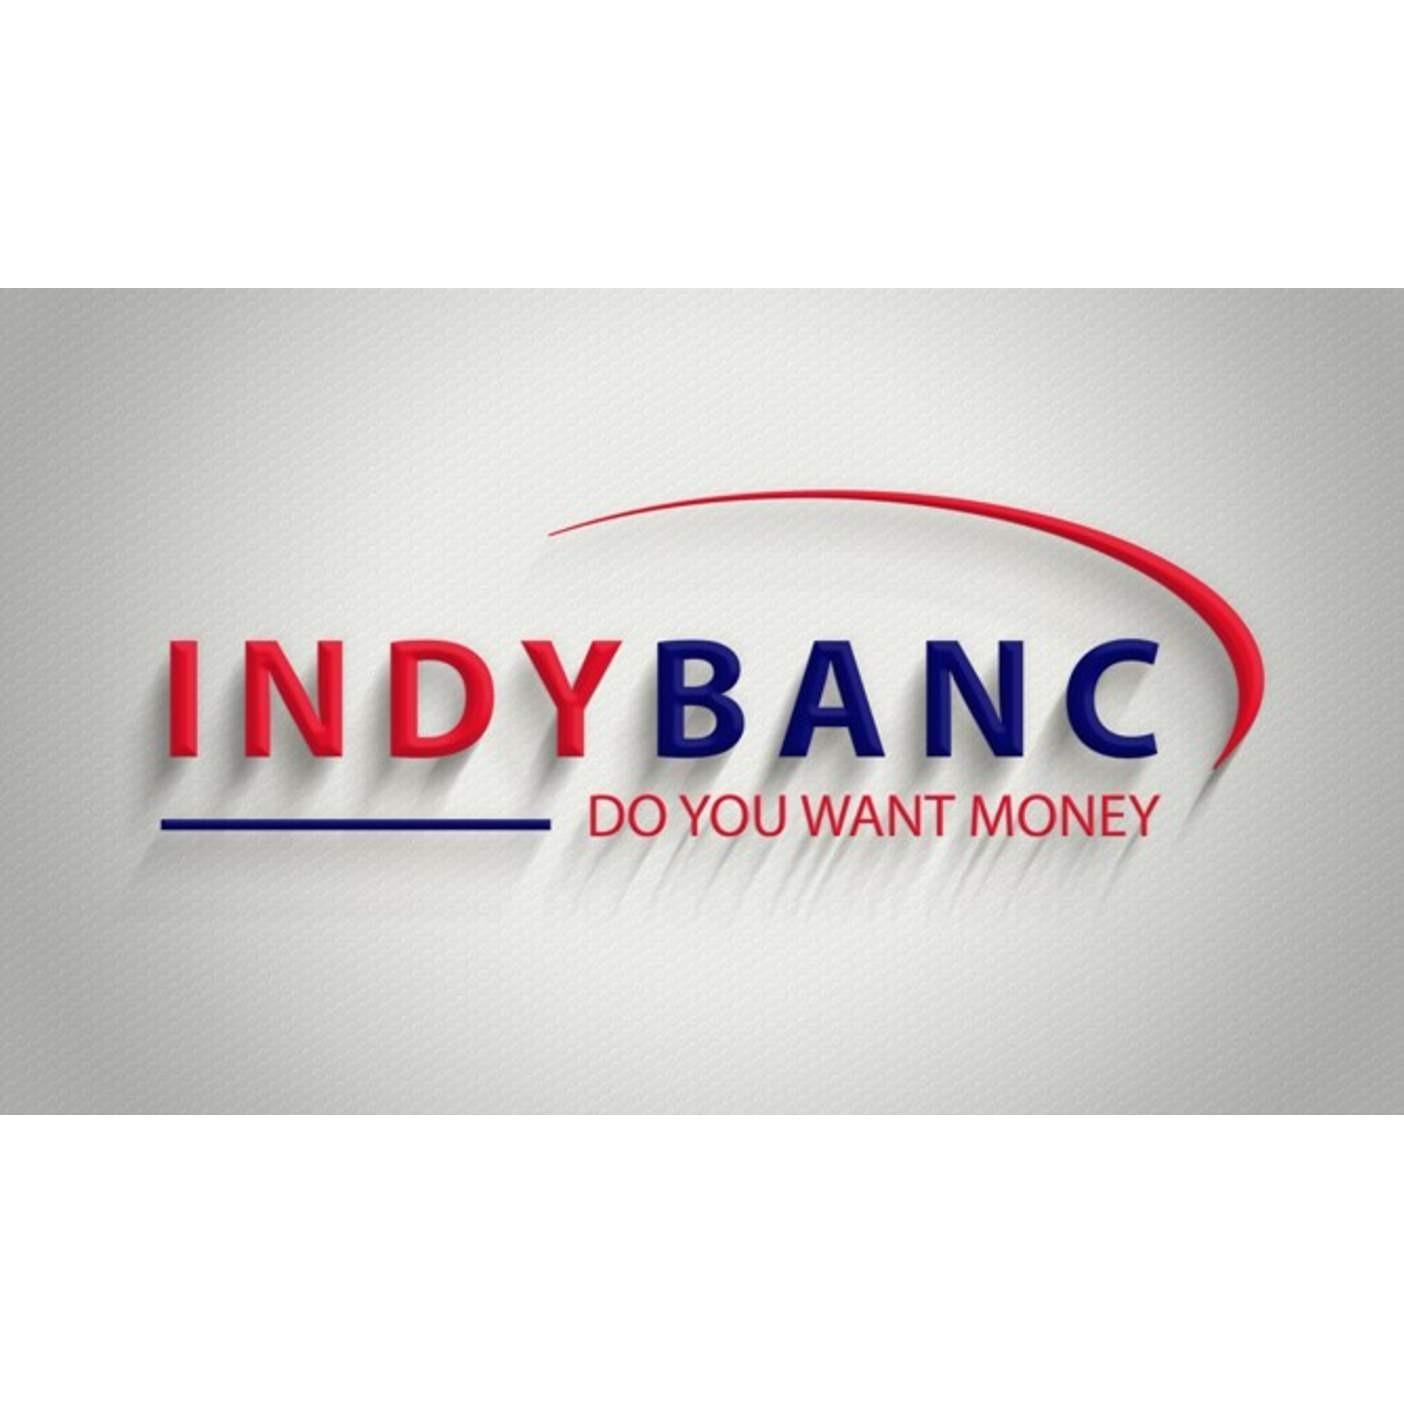 IndyBanc